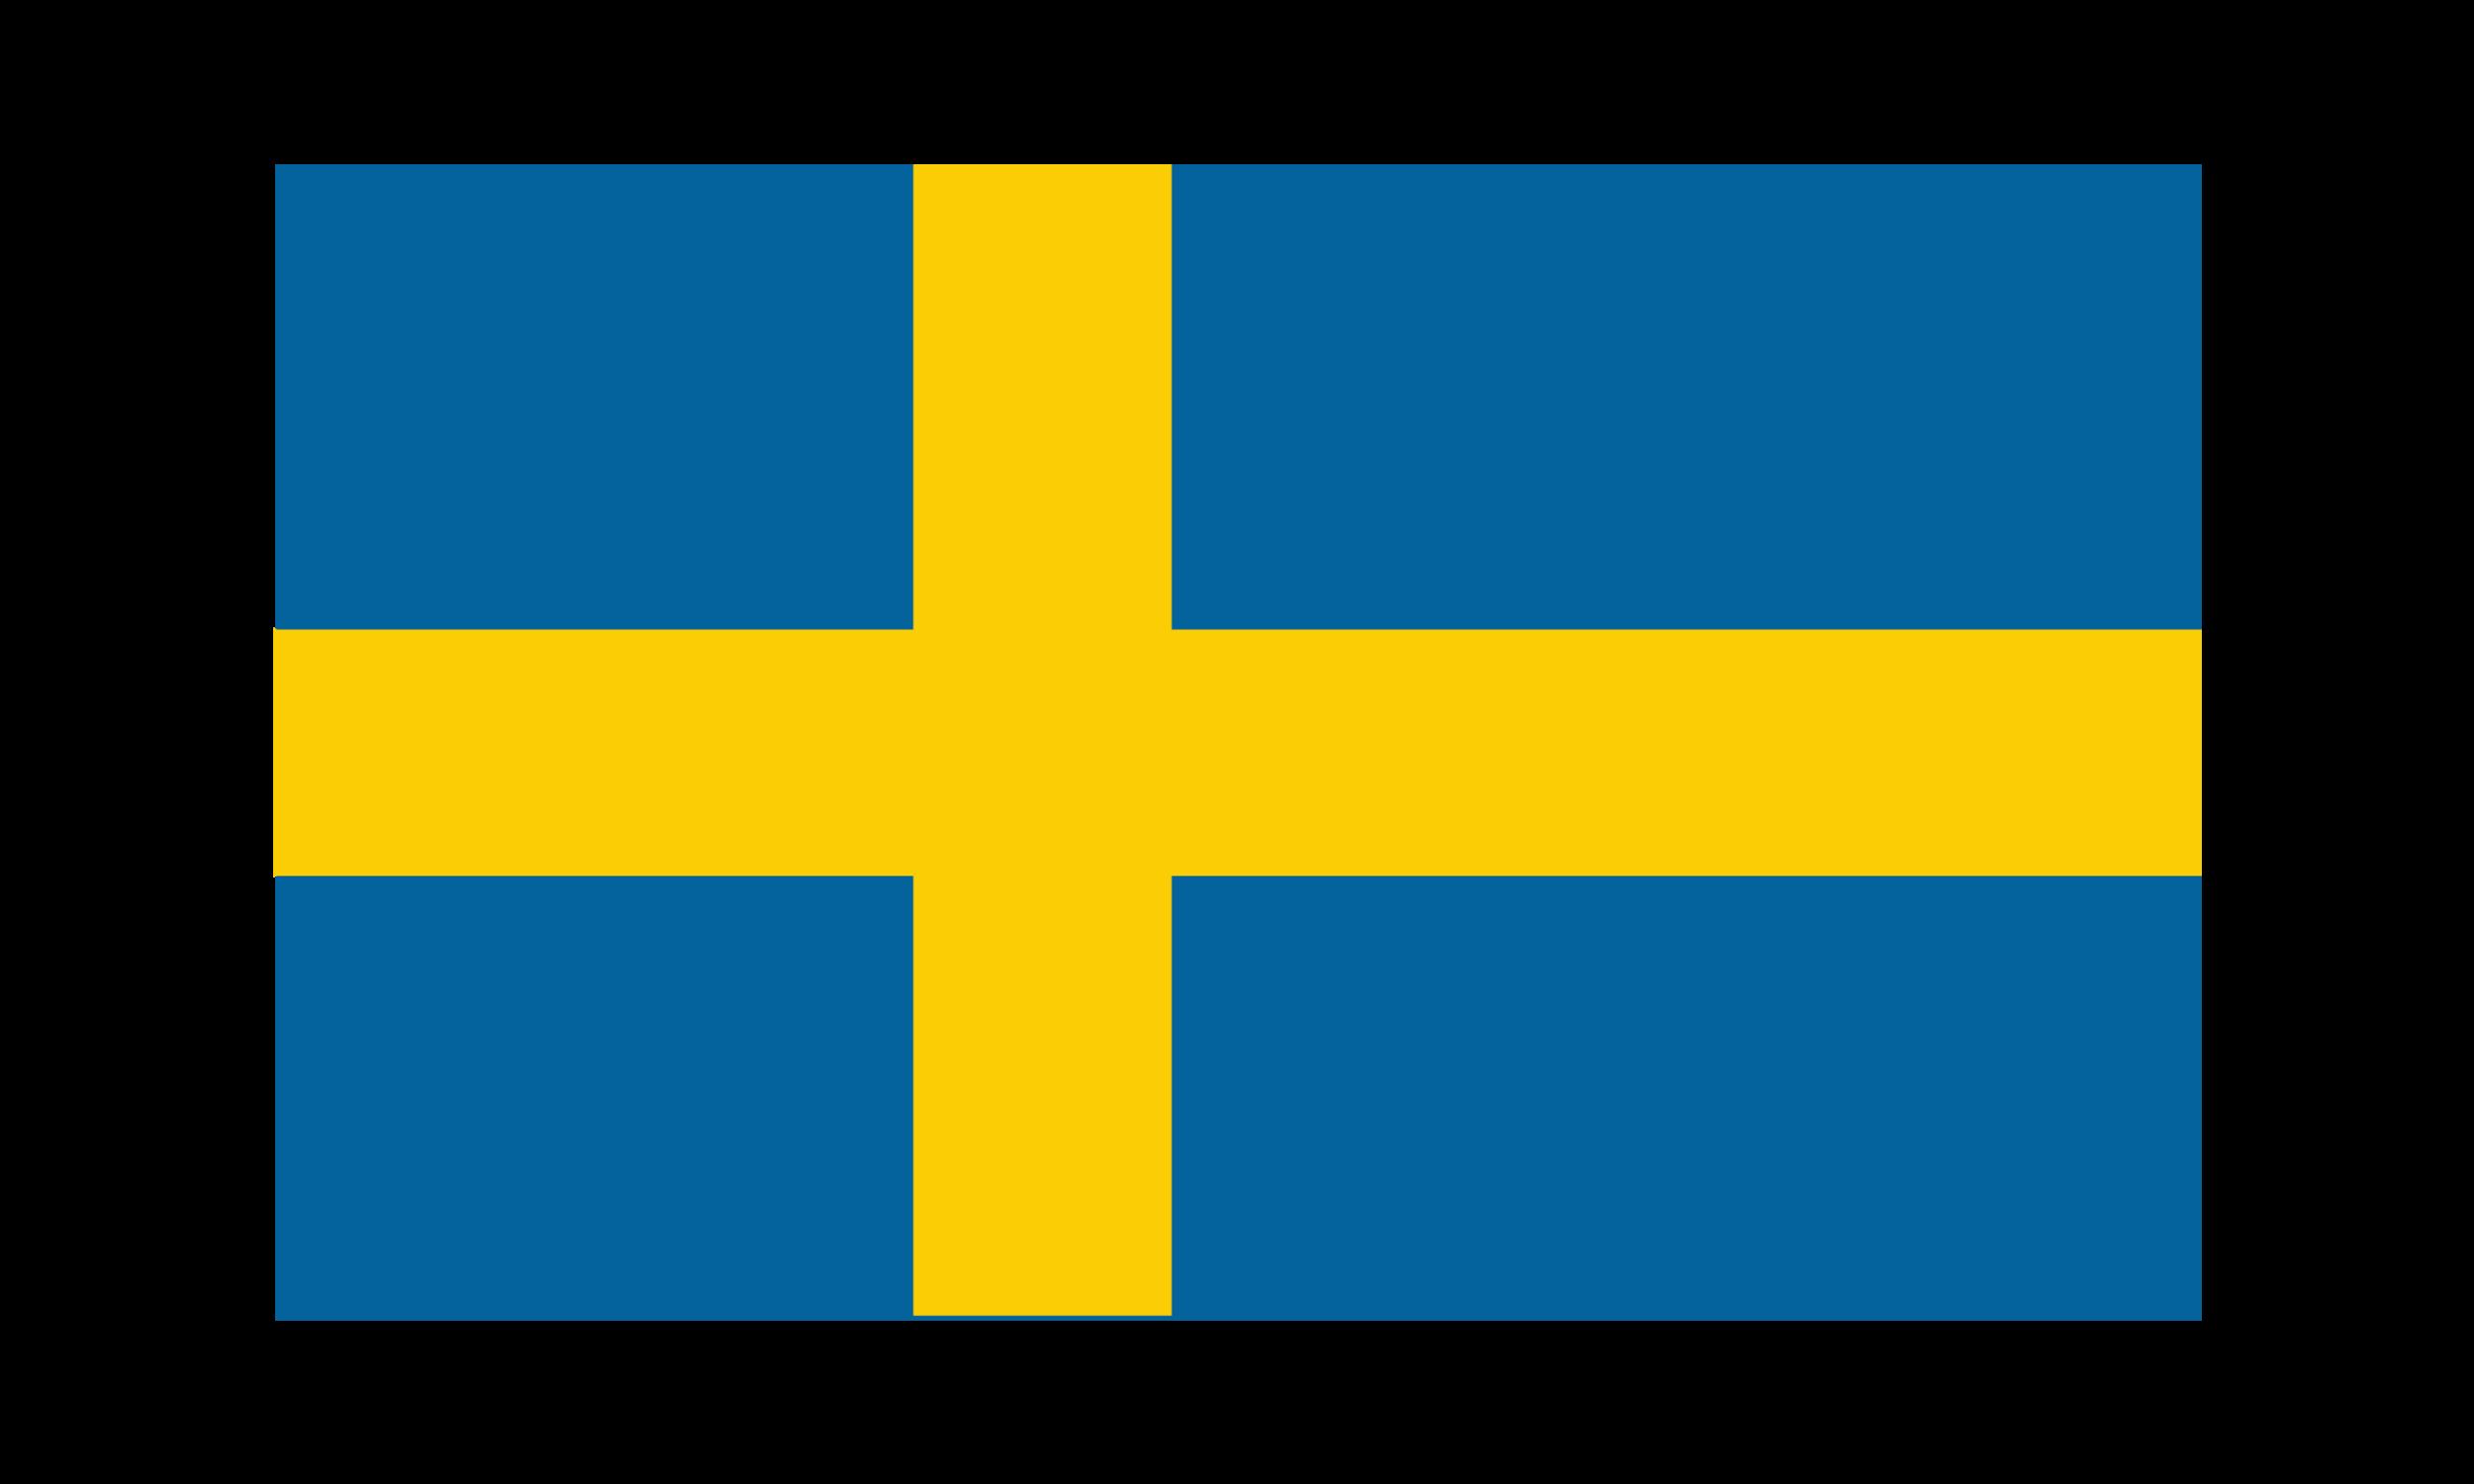 PalmerProductions_Creatives_sweden.png